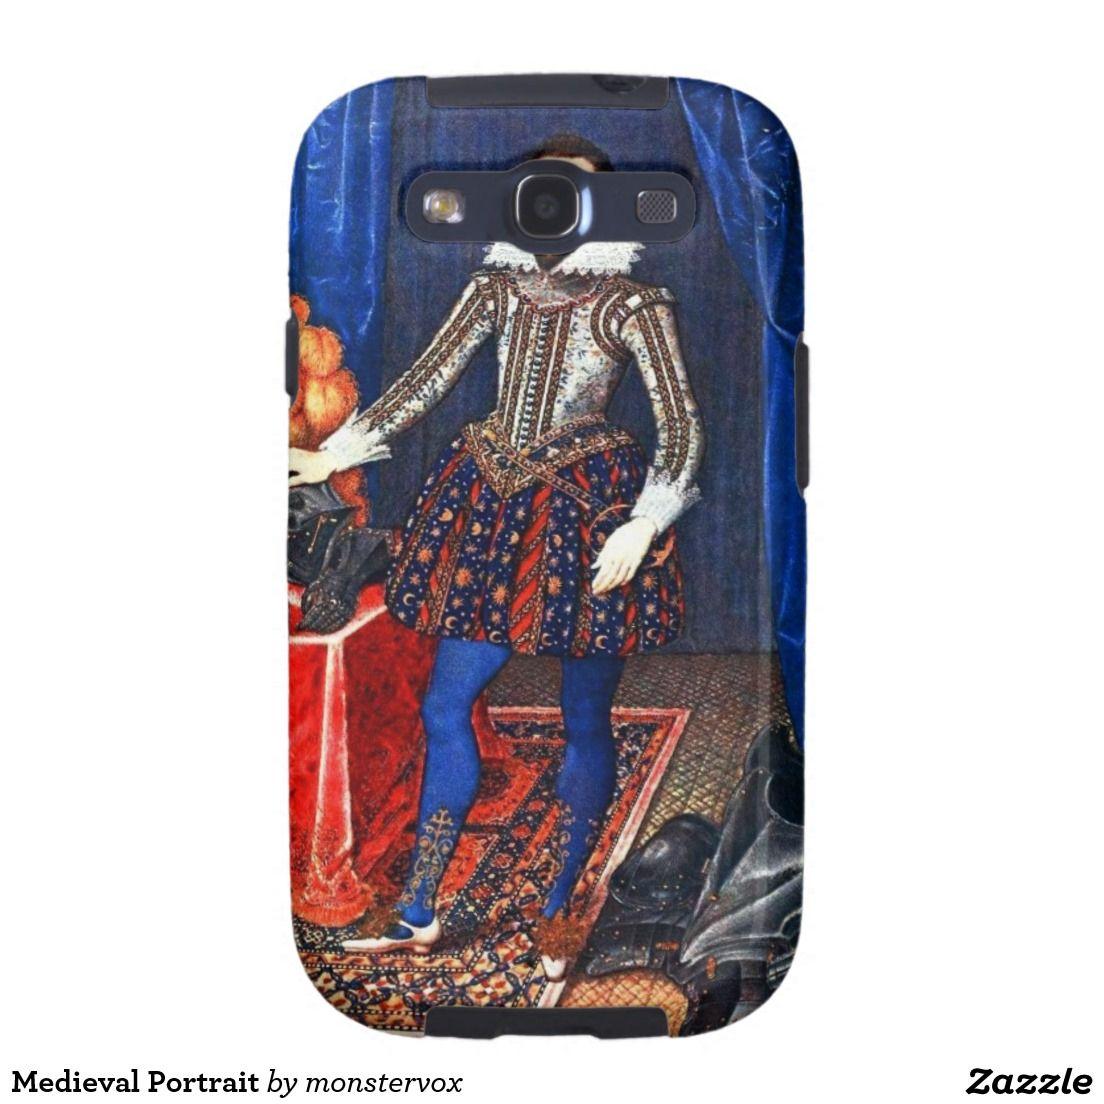 Medieval Portrait Galaxy SIII Cases Medieval Portrait